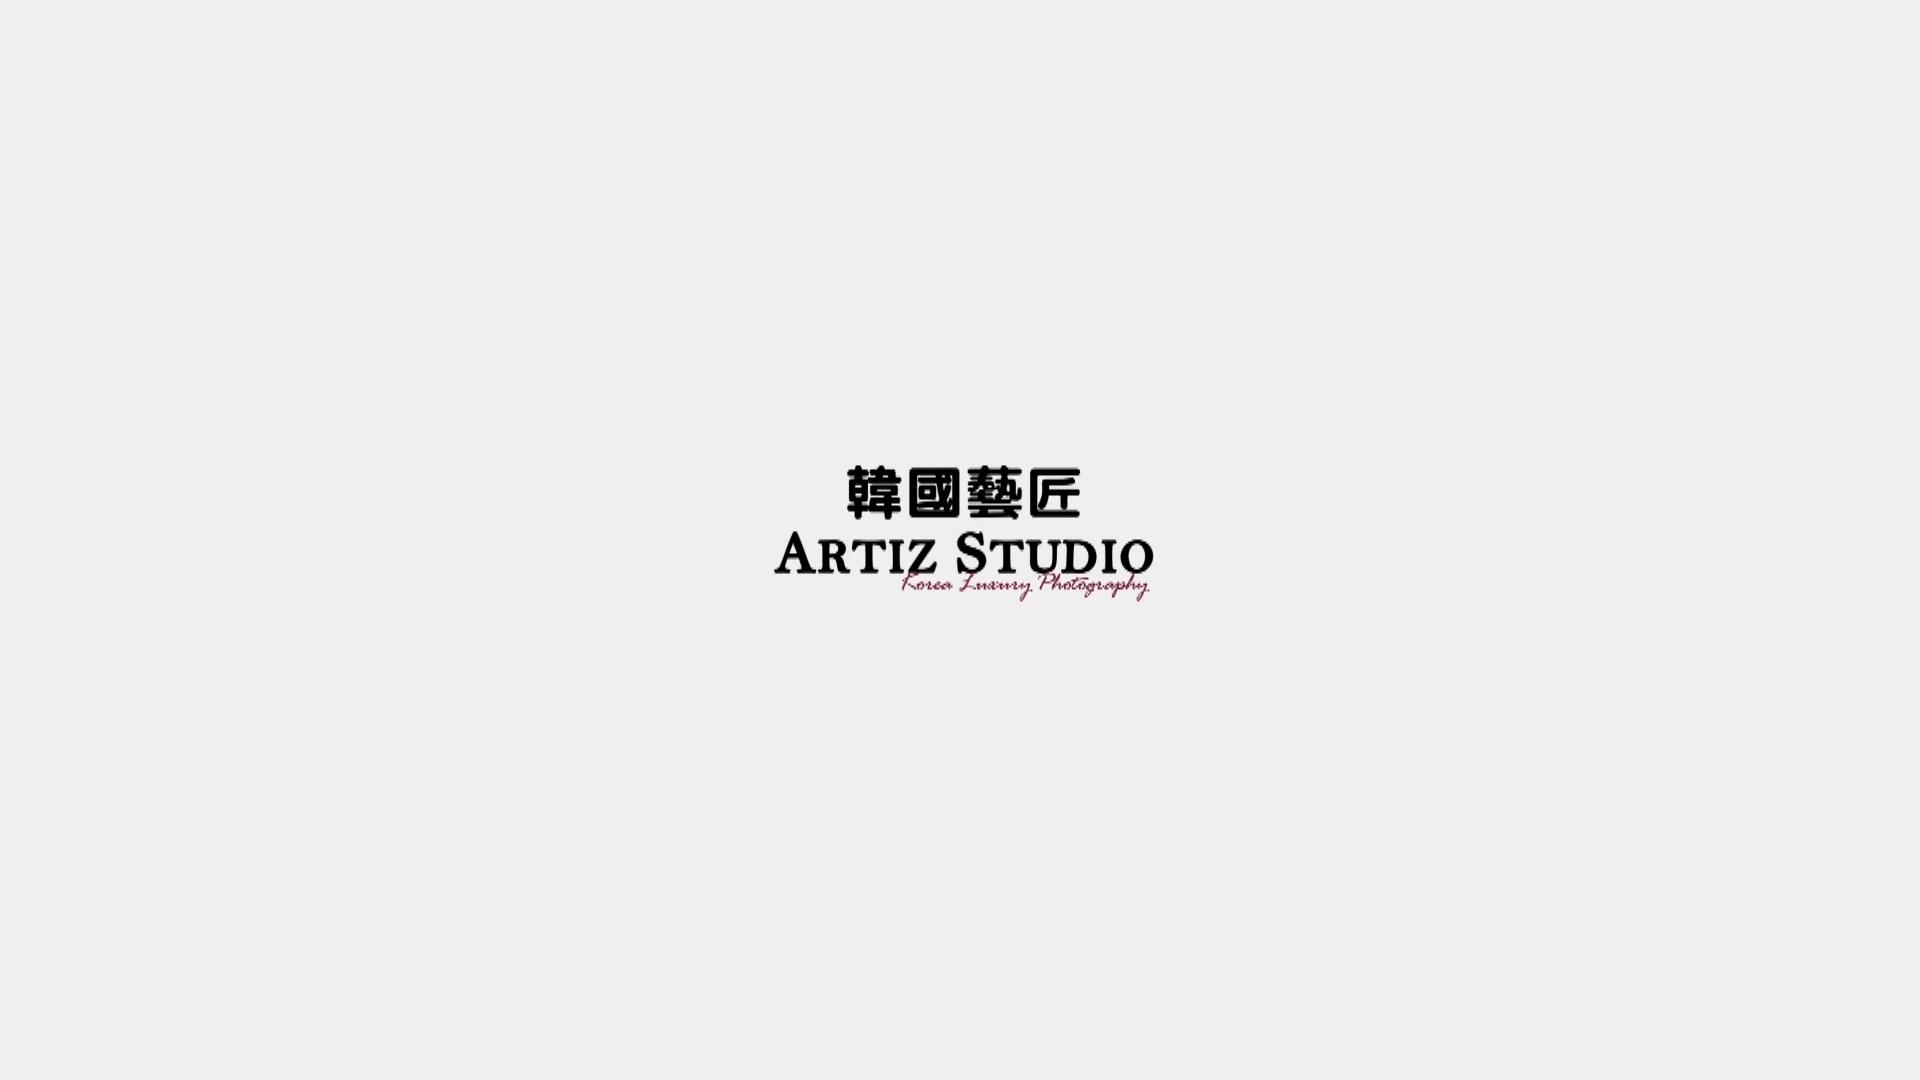 Artiz_Studio_60s